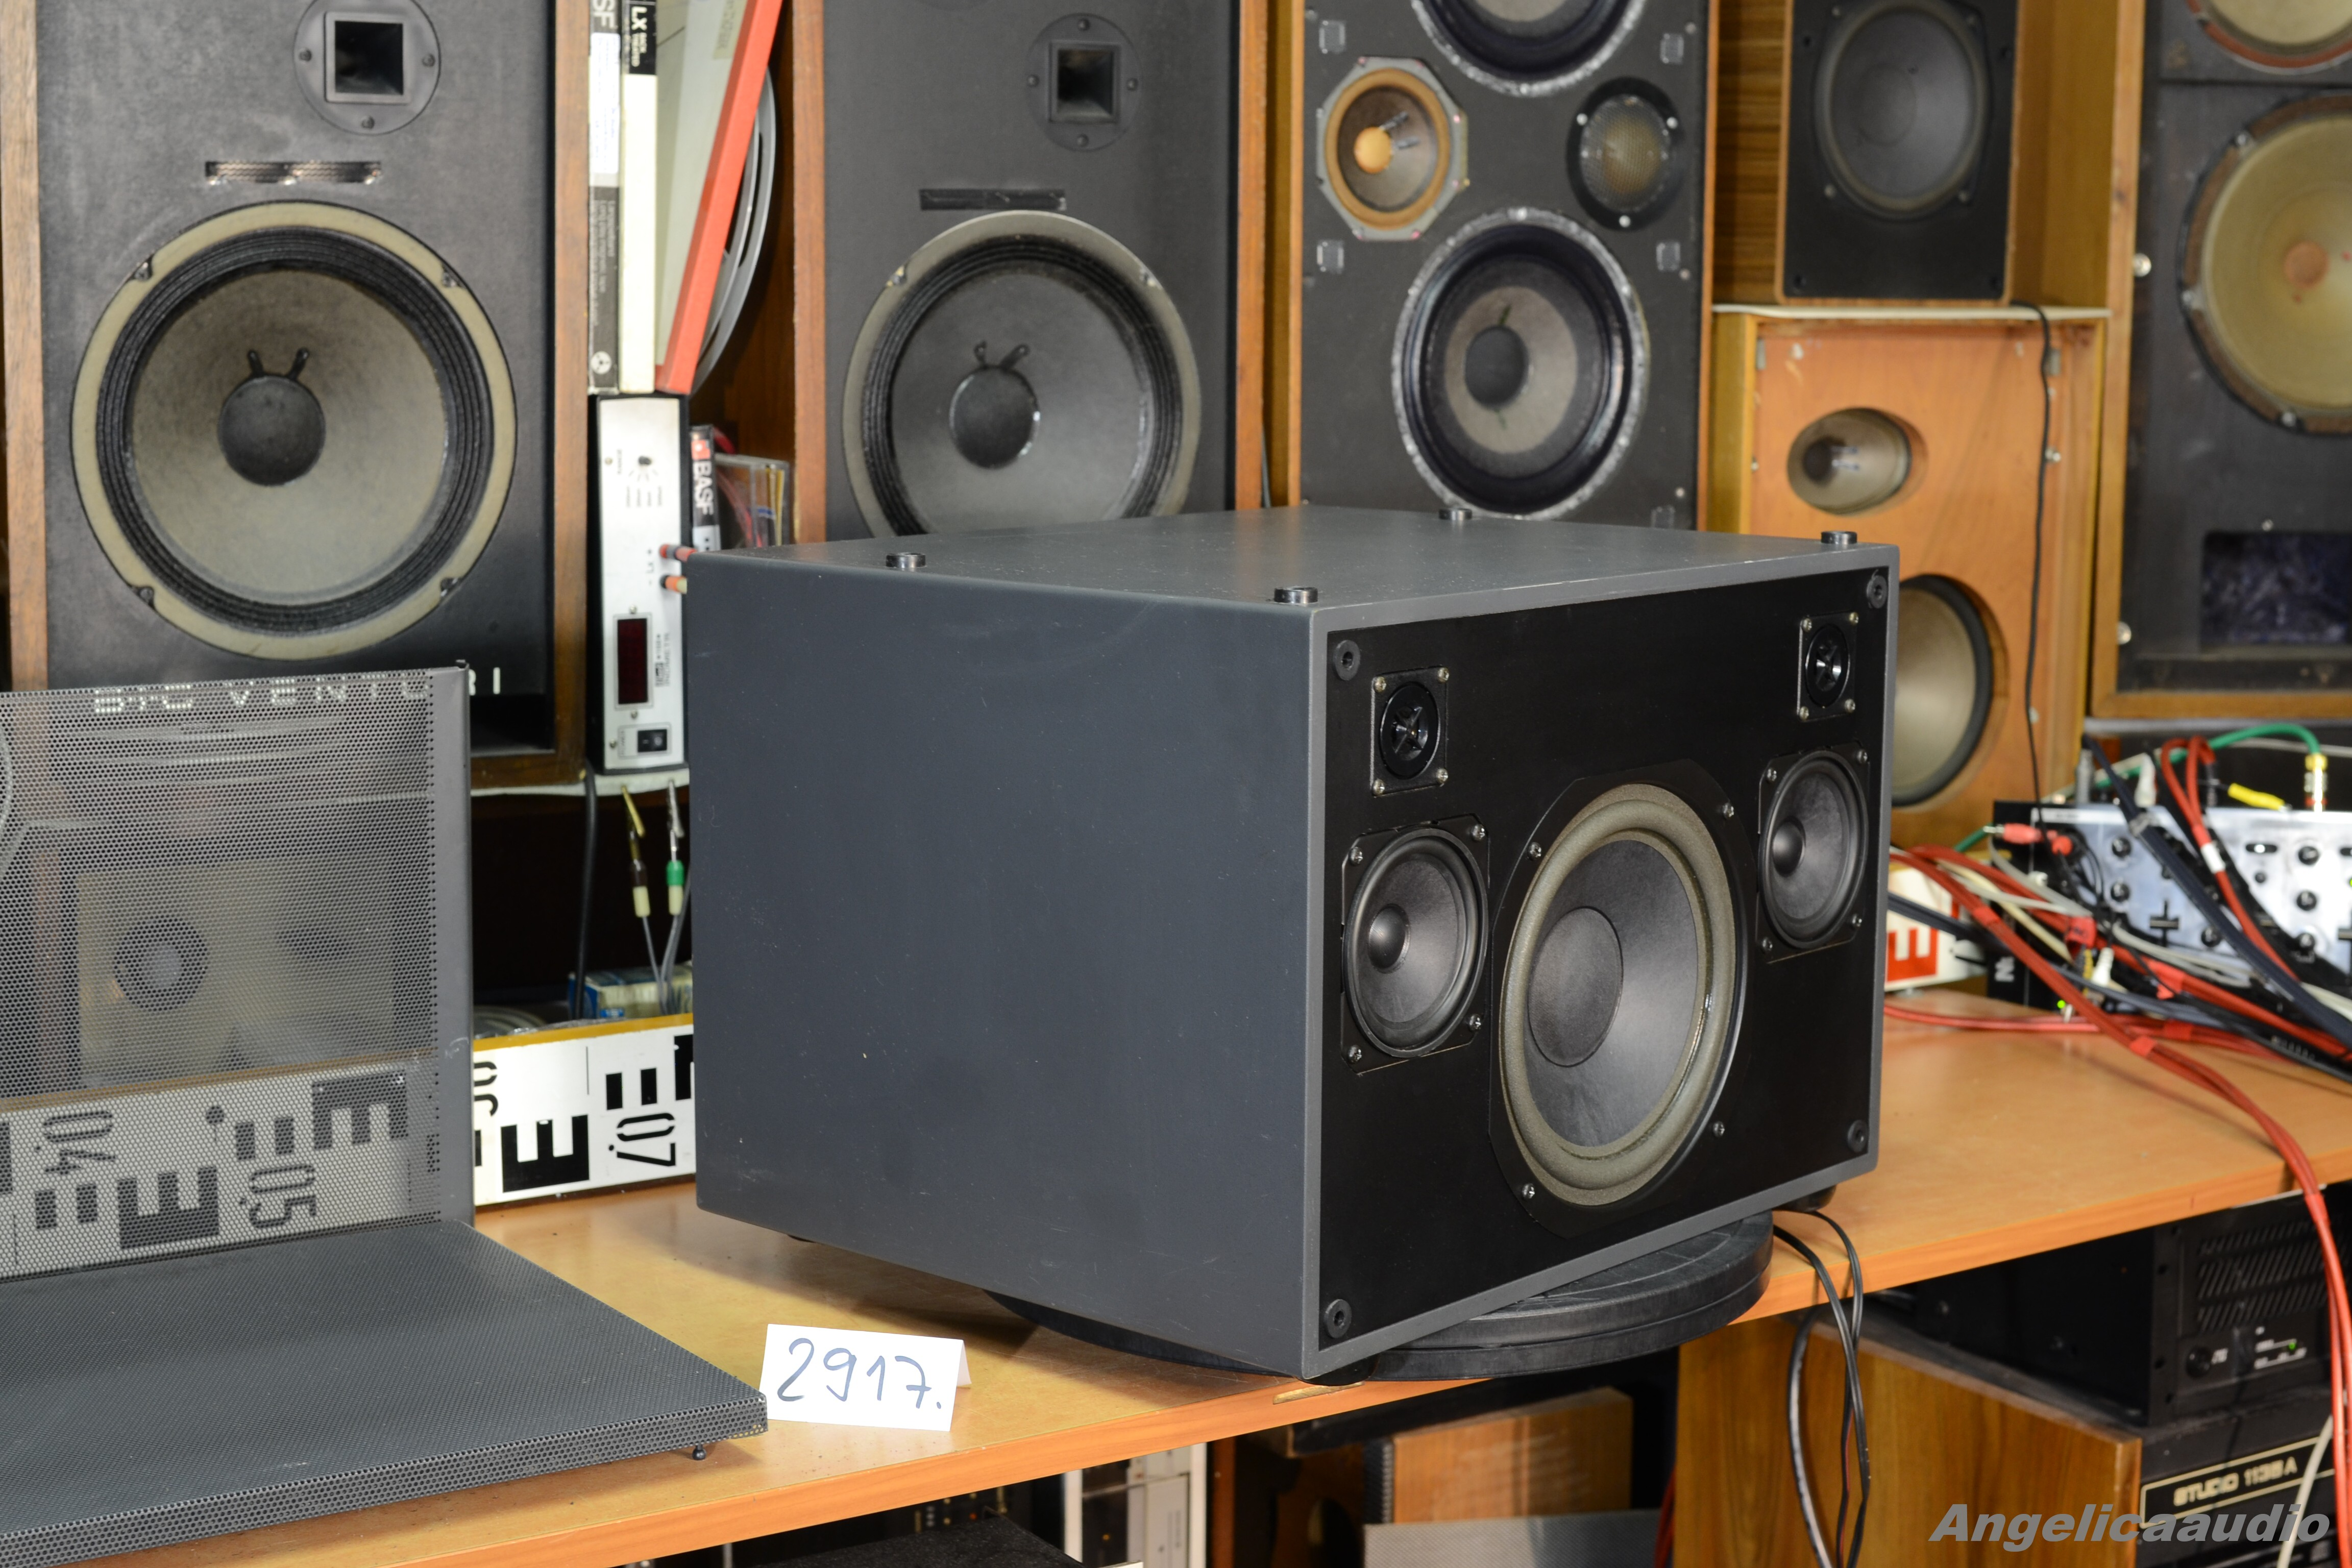 LOEWE Concept Sound Box Passiv STEREO (17 KG), W Germany (No